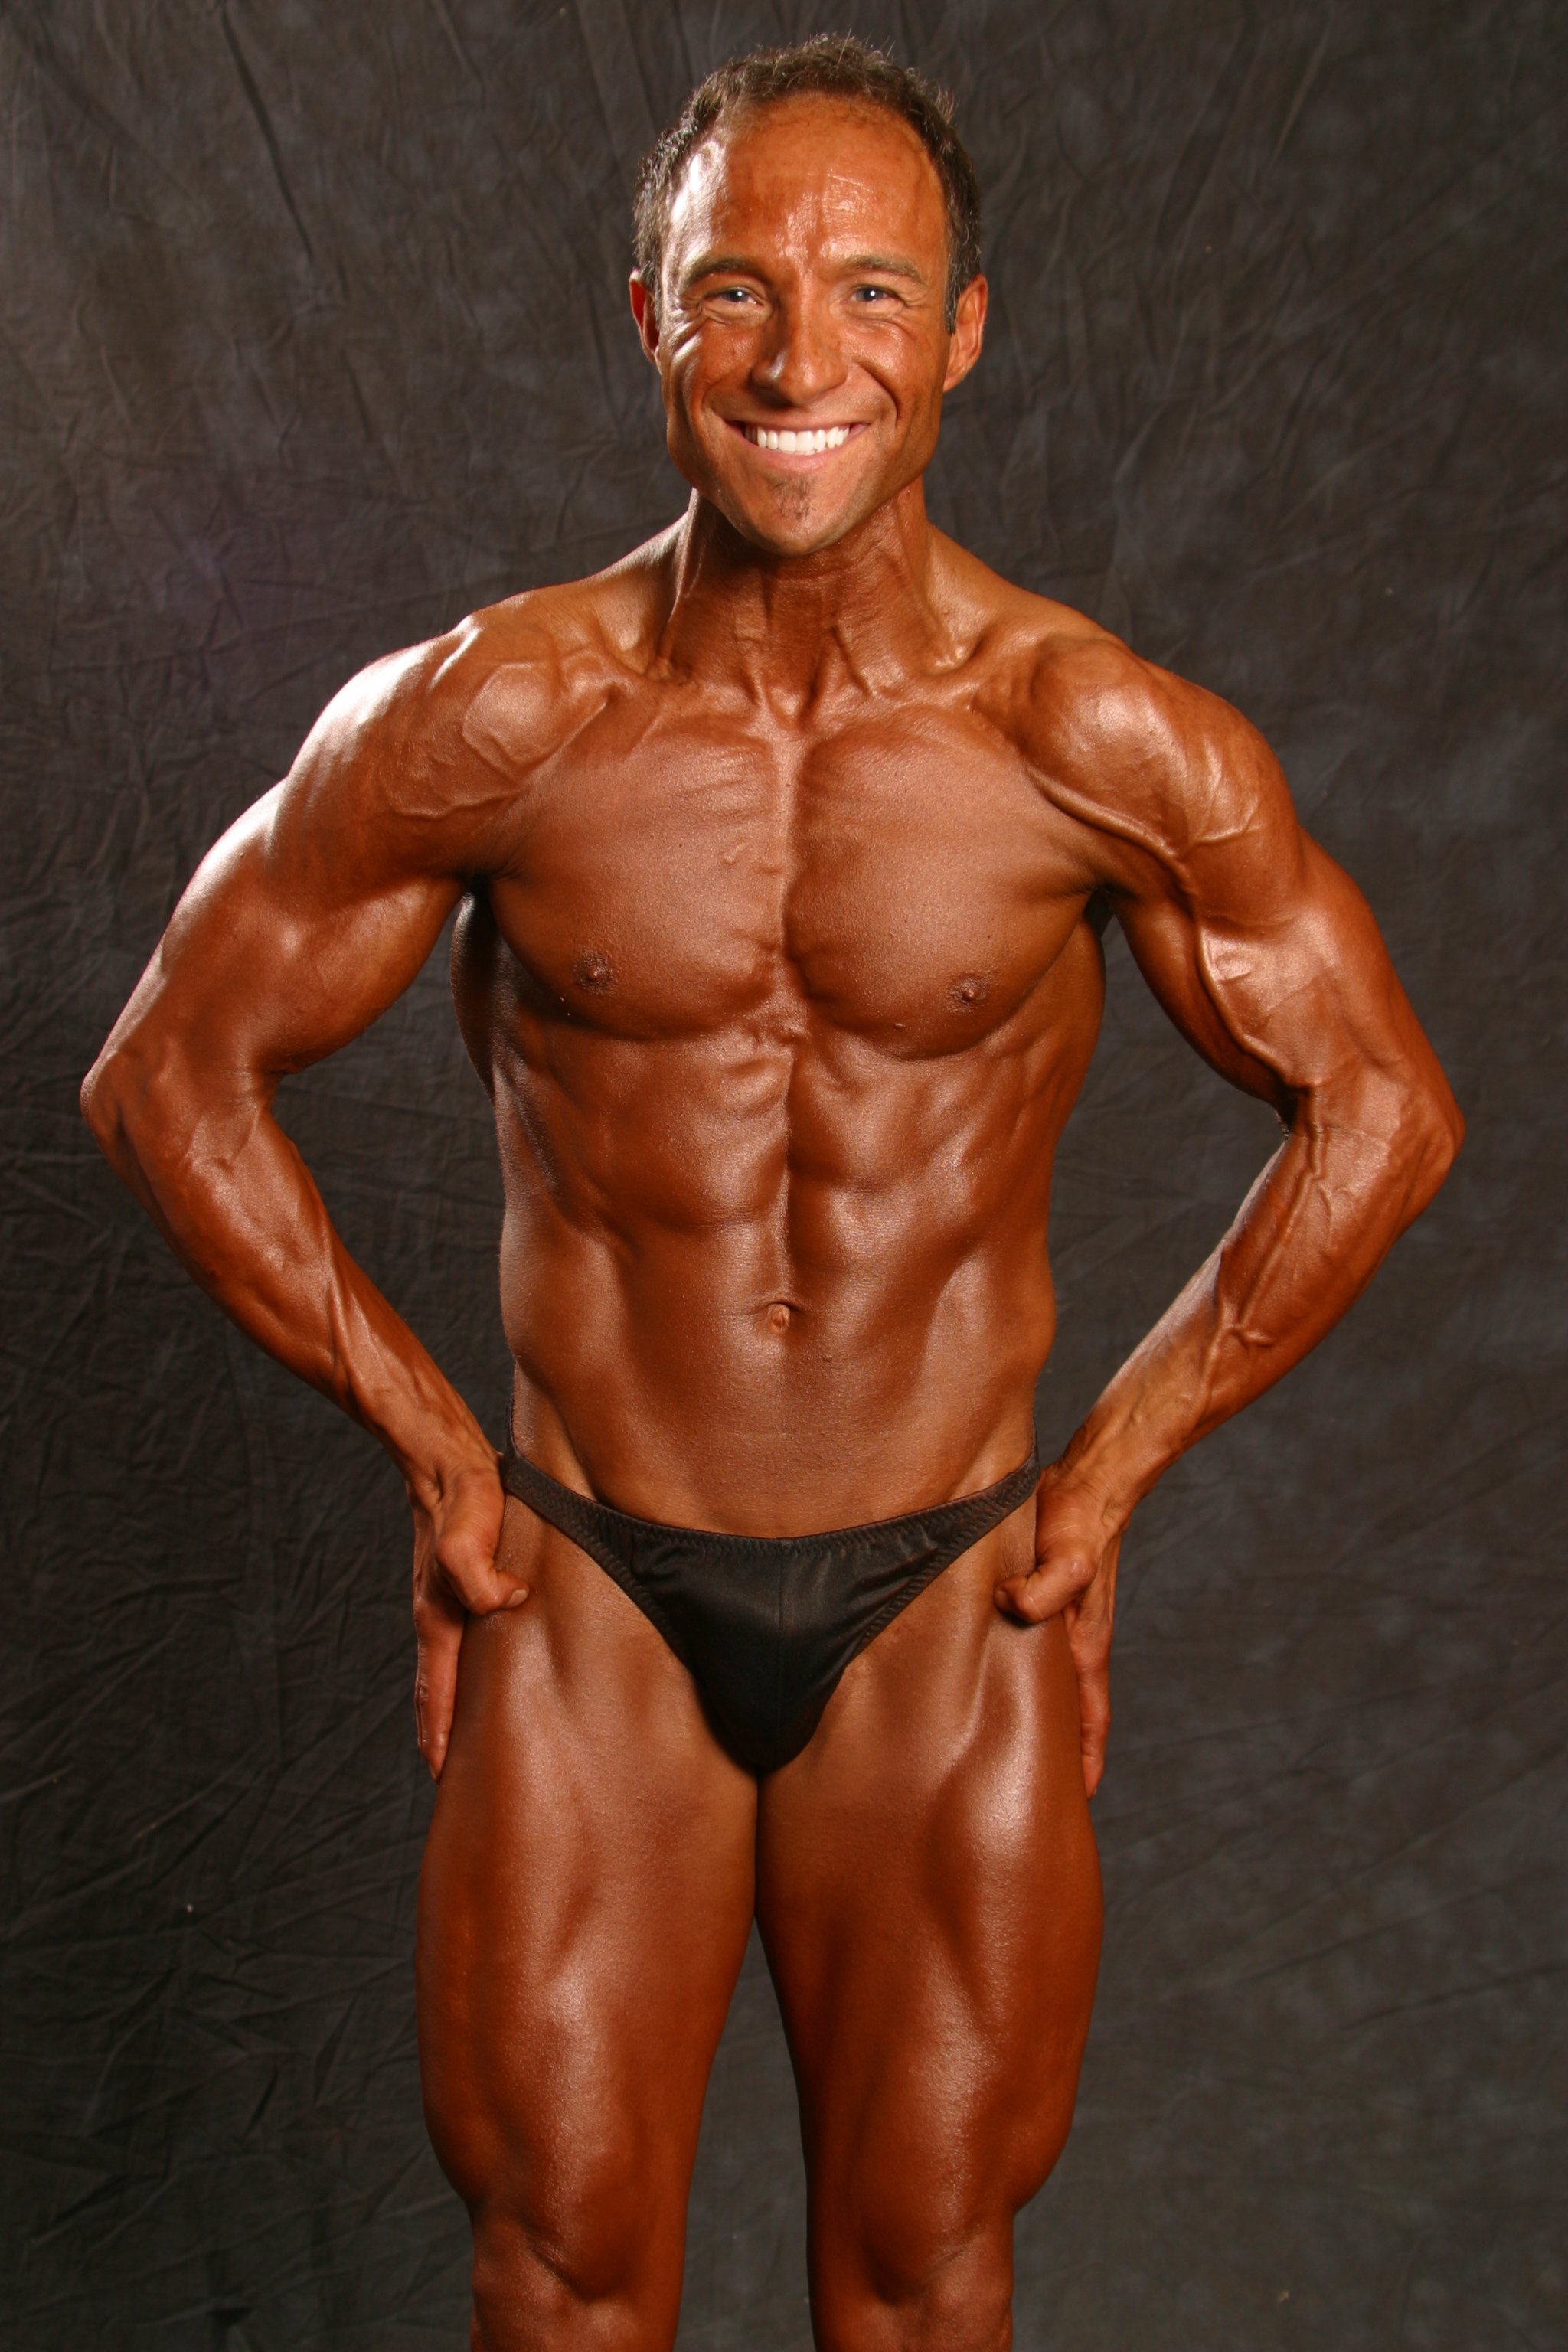 Jim Ribau - Bodybuilding - 2007 06 23 - 11 - Most Muscular pose